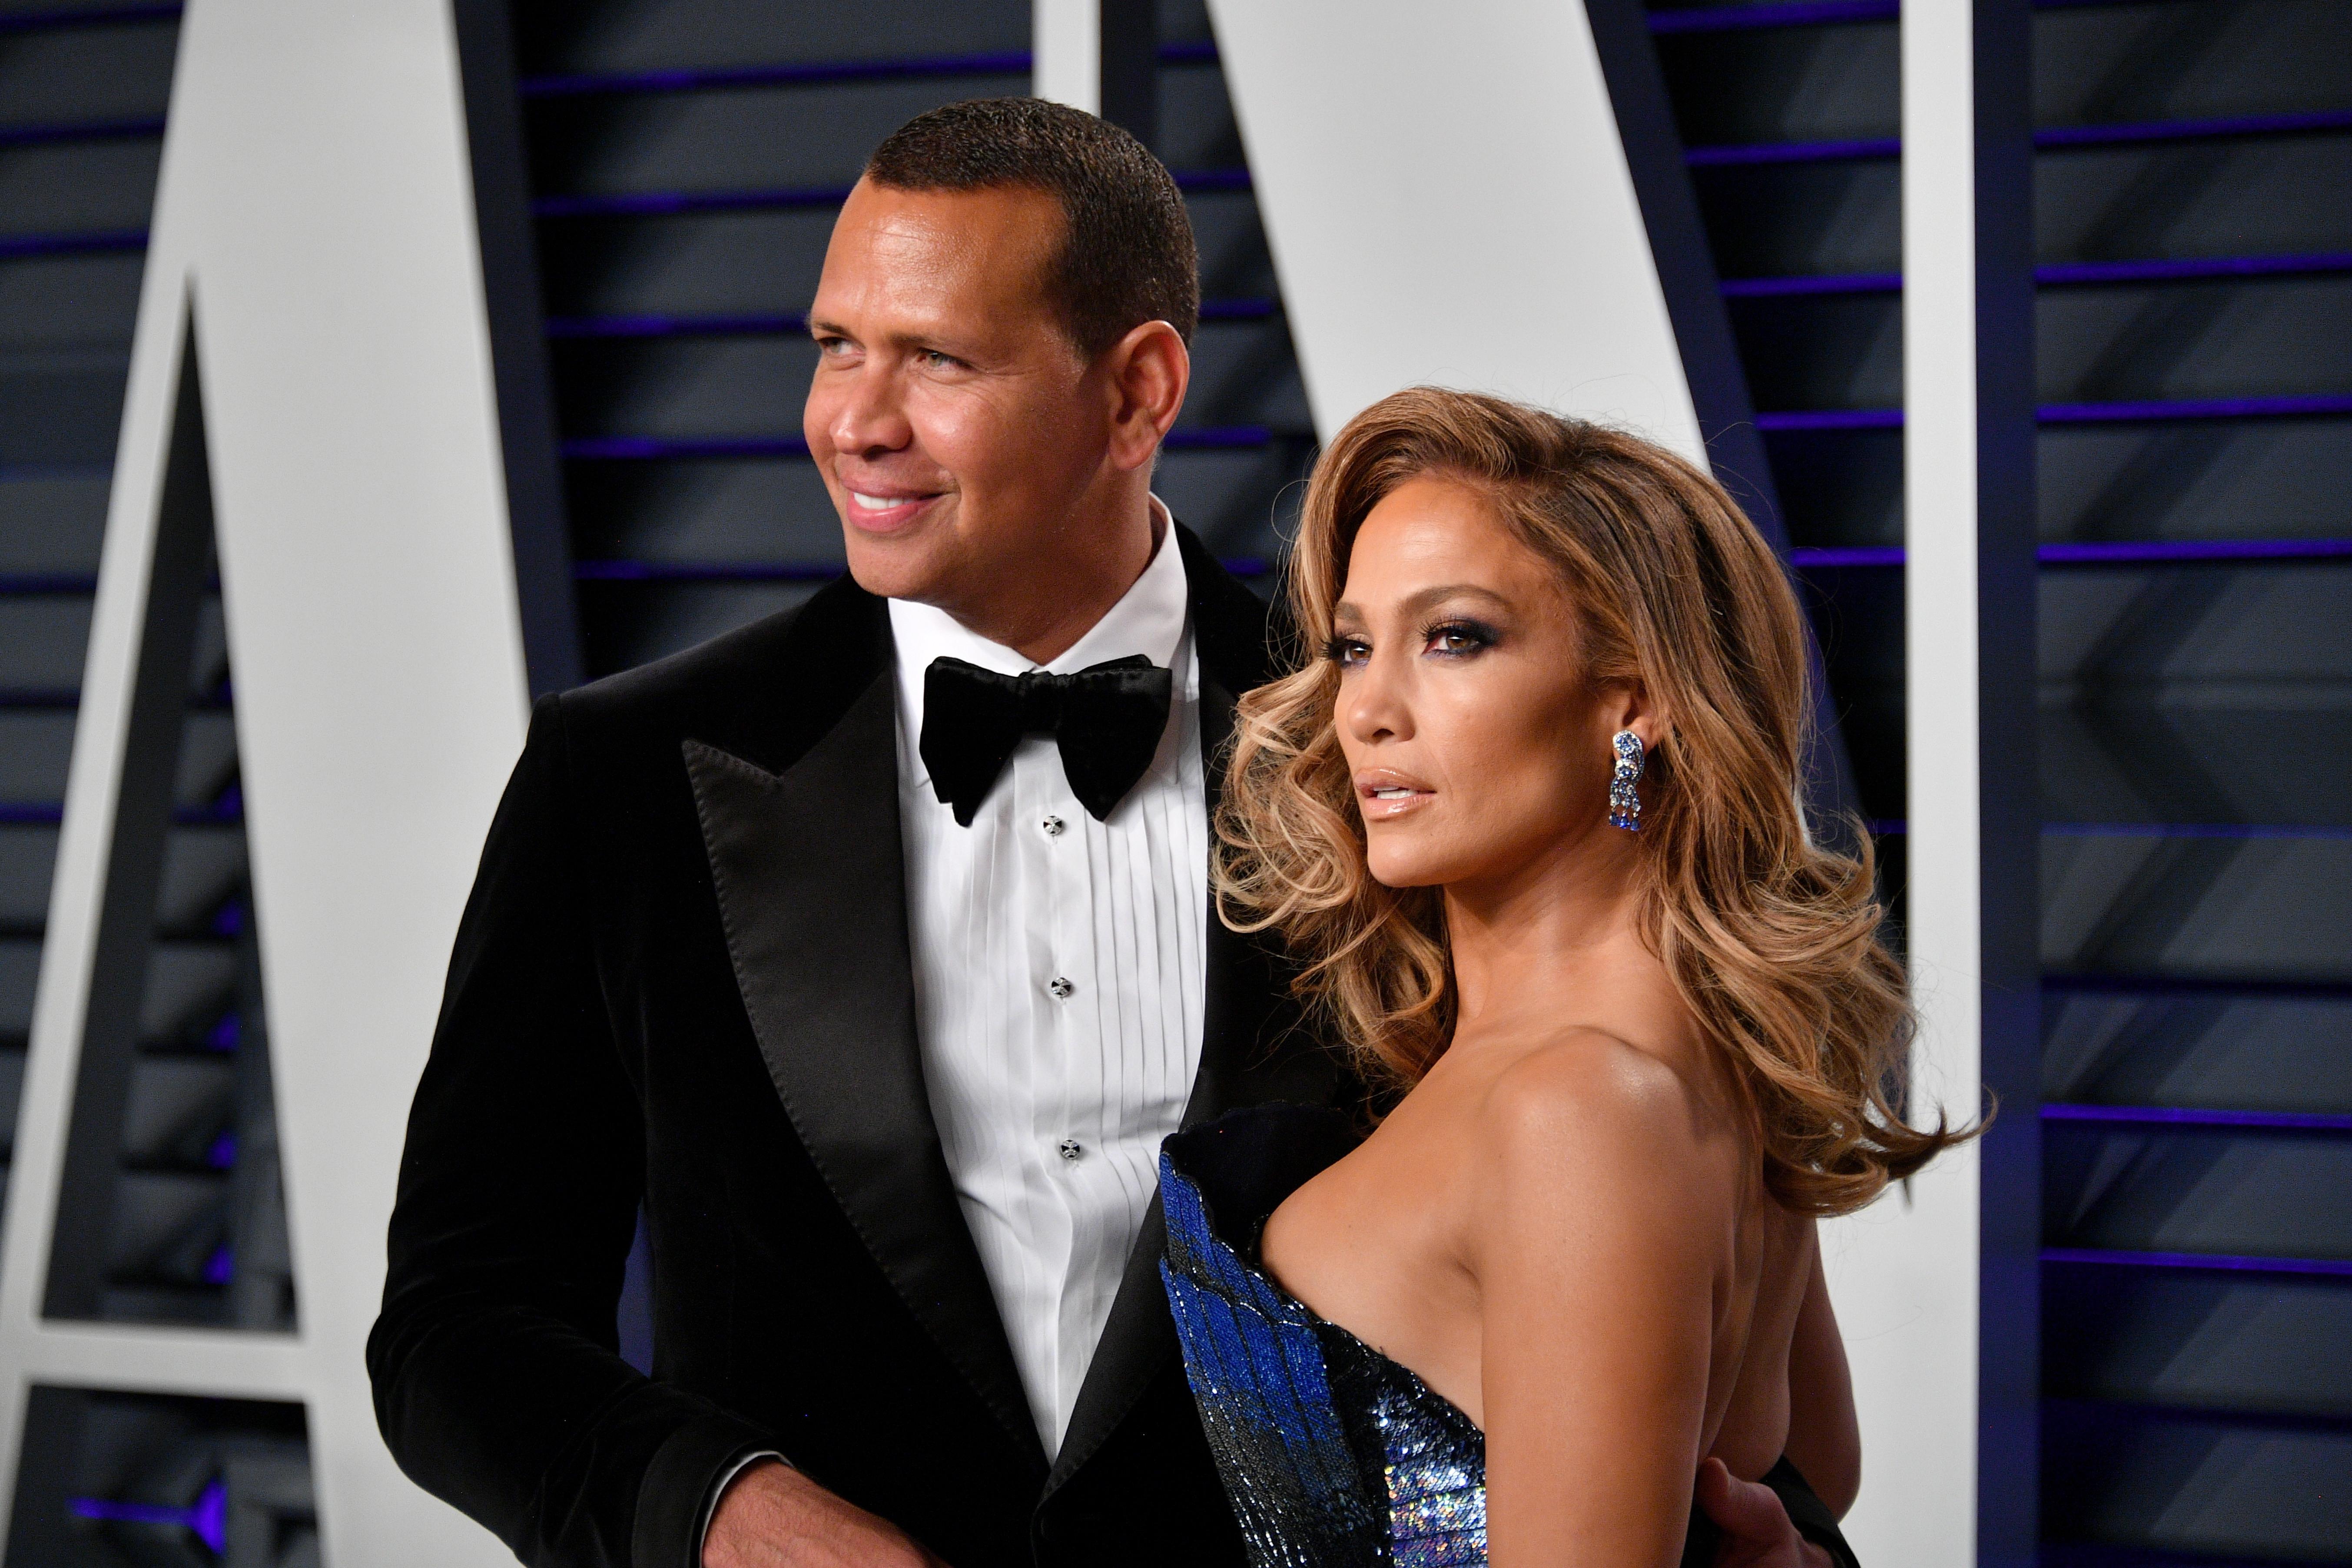 A fortuna que o anel de noivado de Jennifer Lopez vale